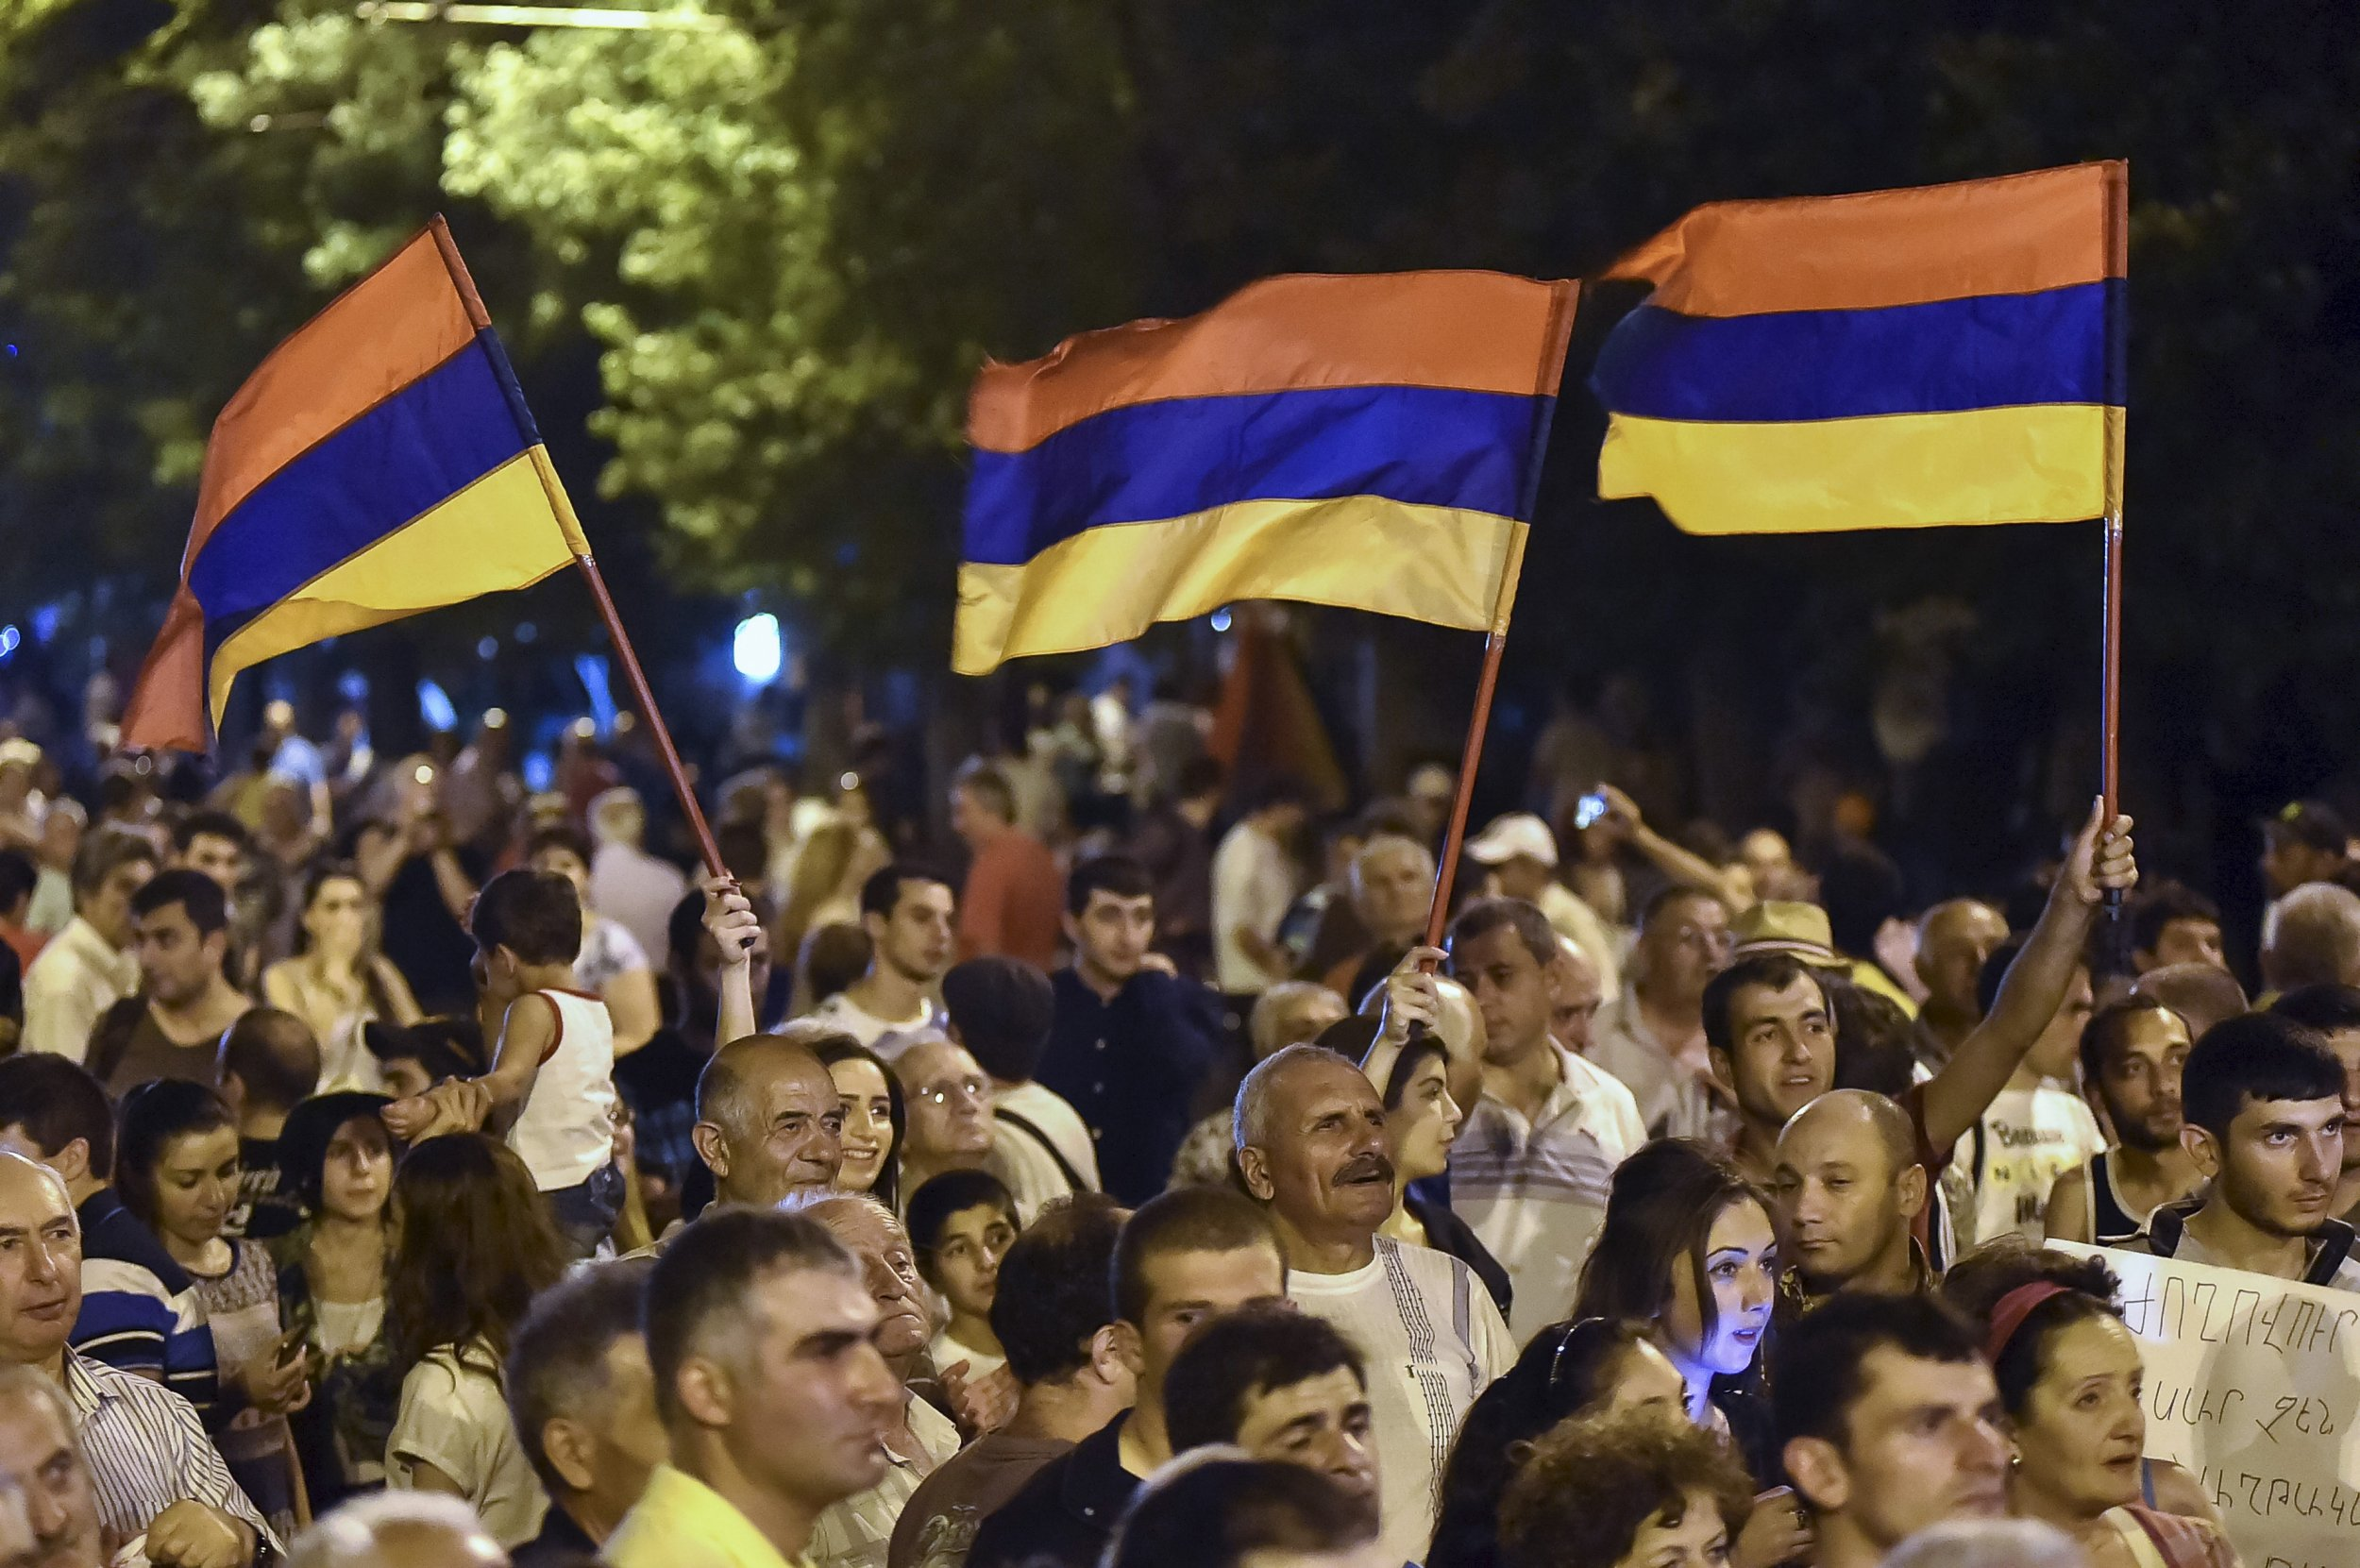 iraq and armenia relationship